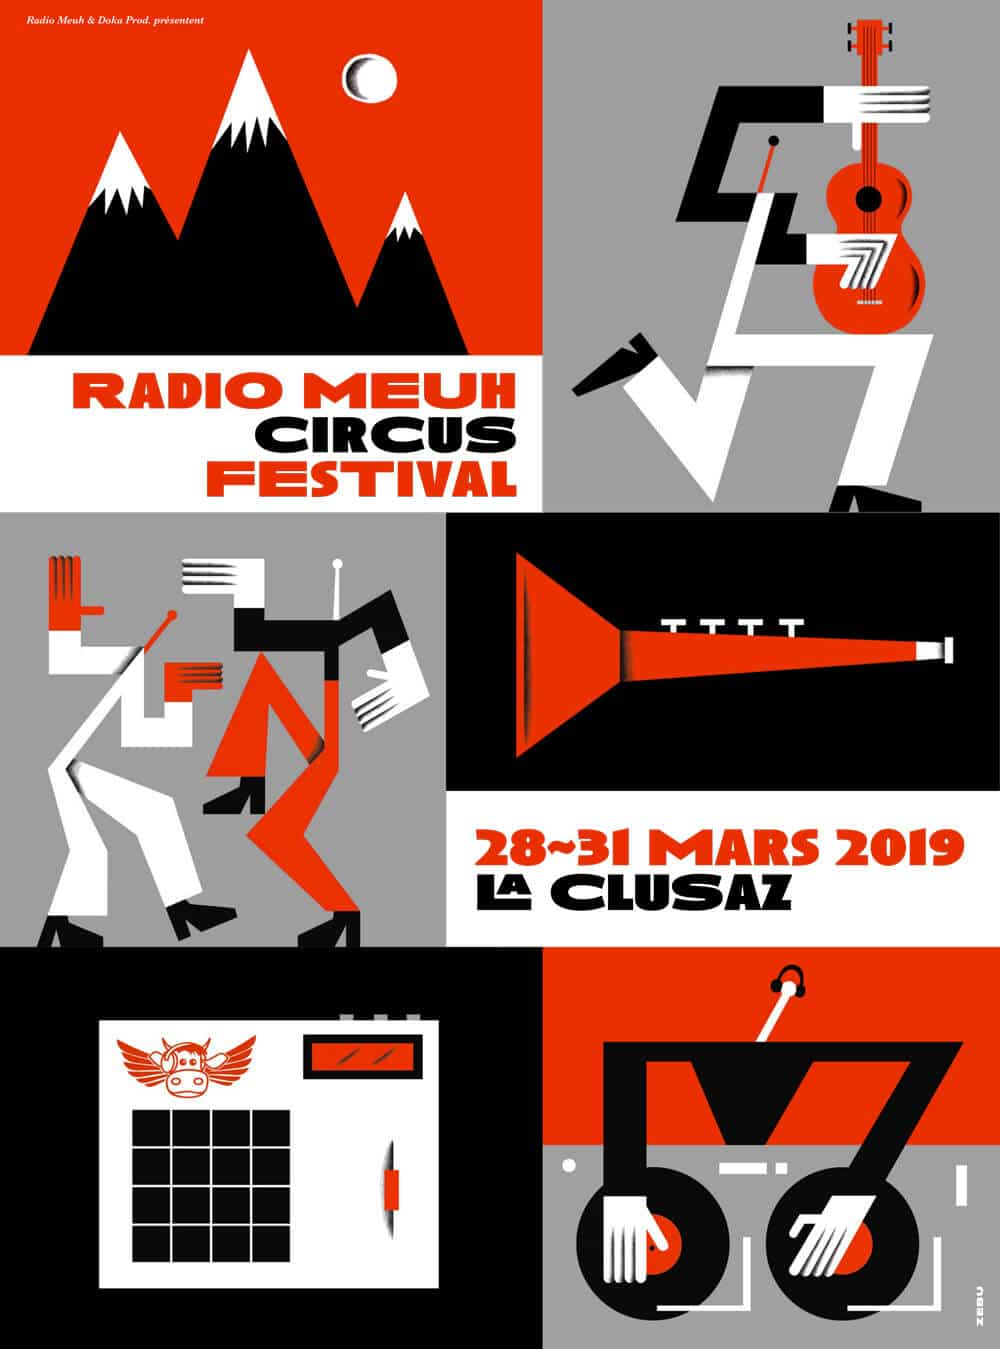 Affiche du festival Radio Meuh Circus